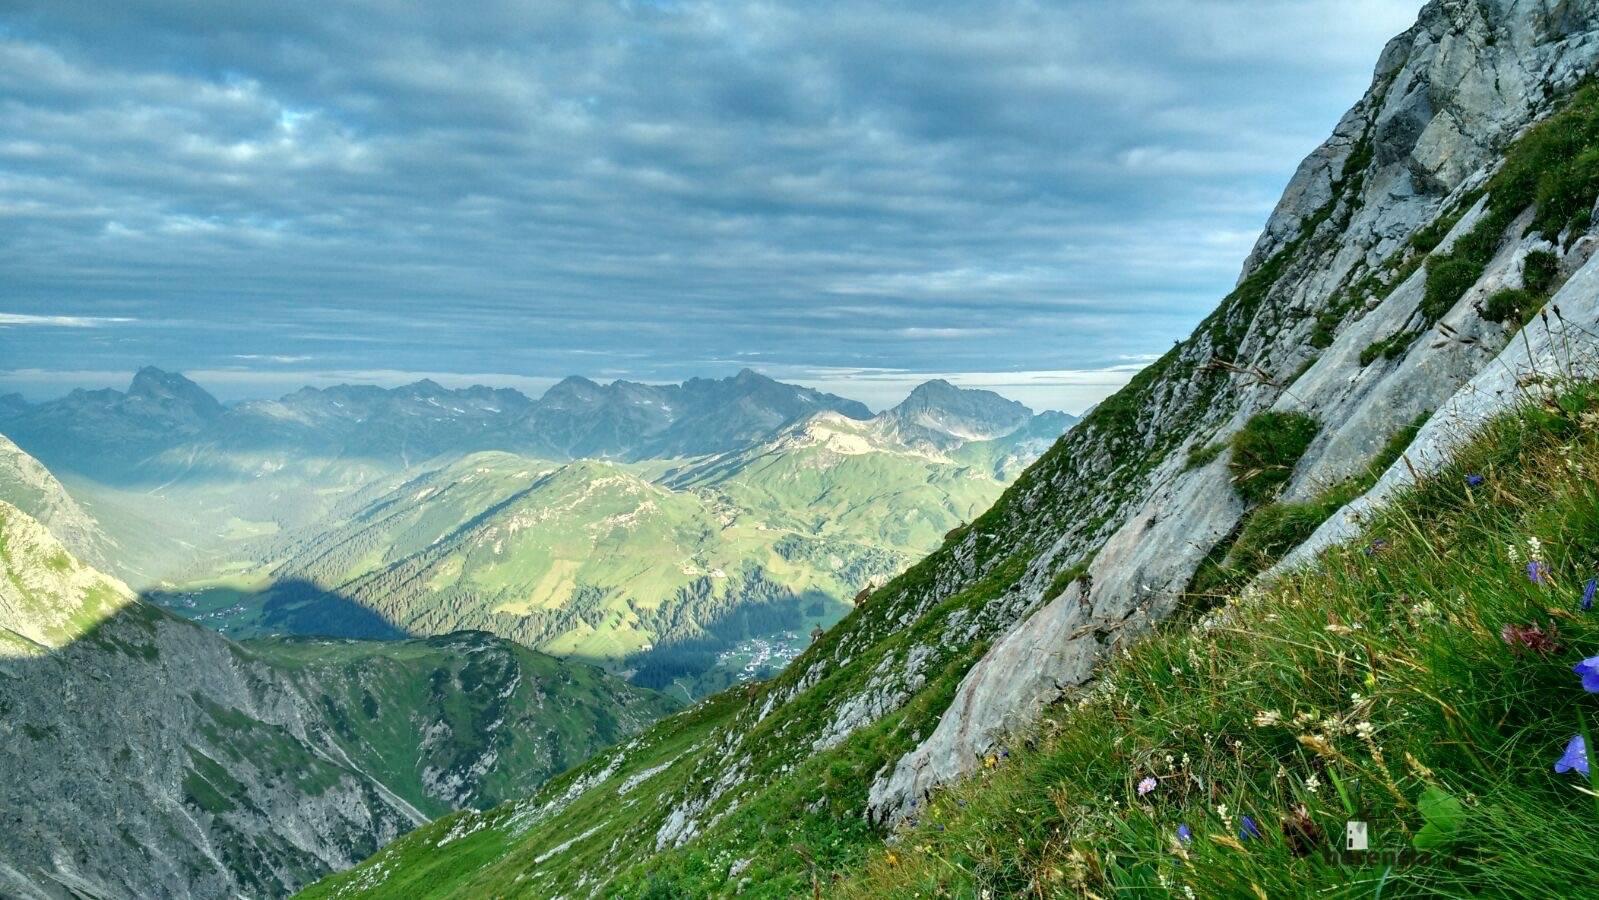 Etapa 34 Perle en los Alpes tiroleses02 - Etapa 34. Perlé en los Alpes tiroleses